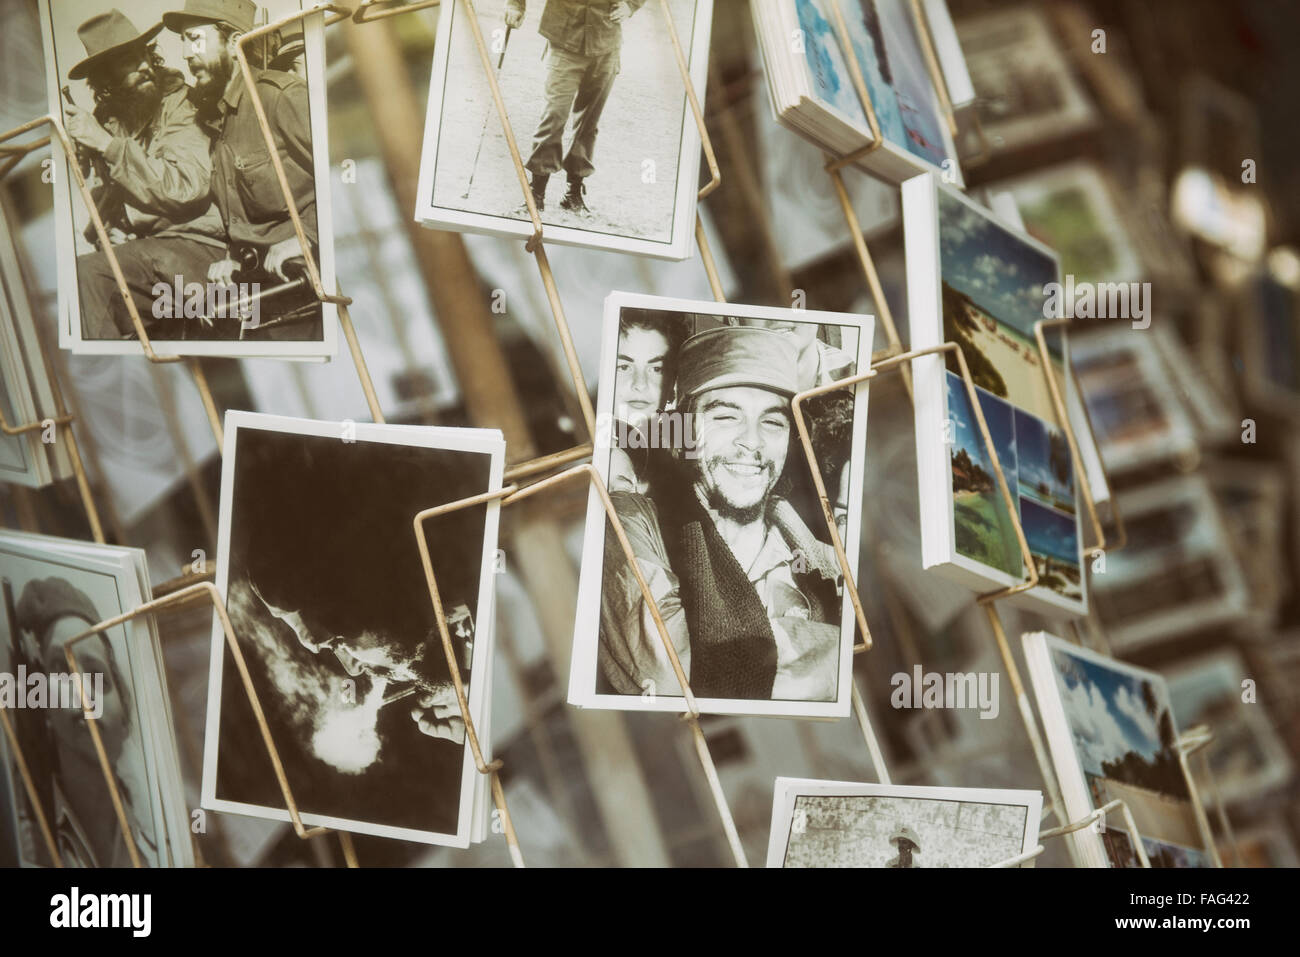 Che Guevara Ansichtskarten, Souvenirs, Havanna, Kuba Stockbild